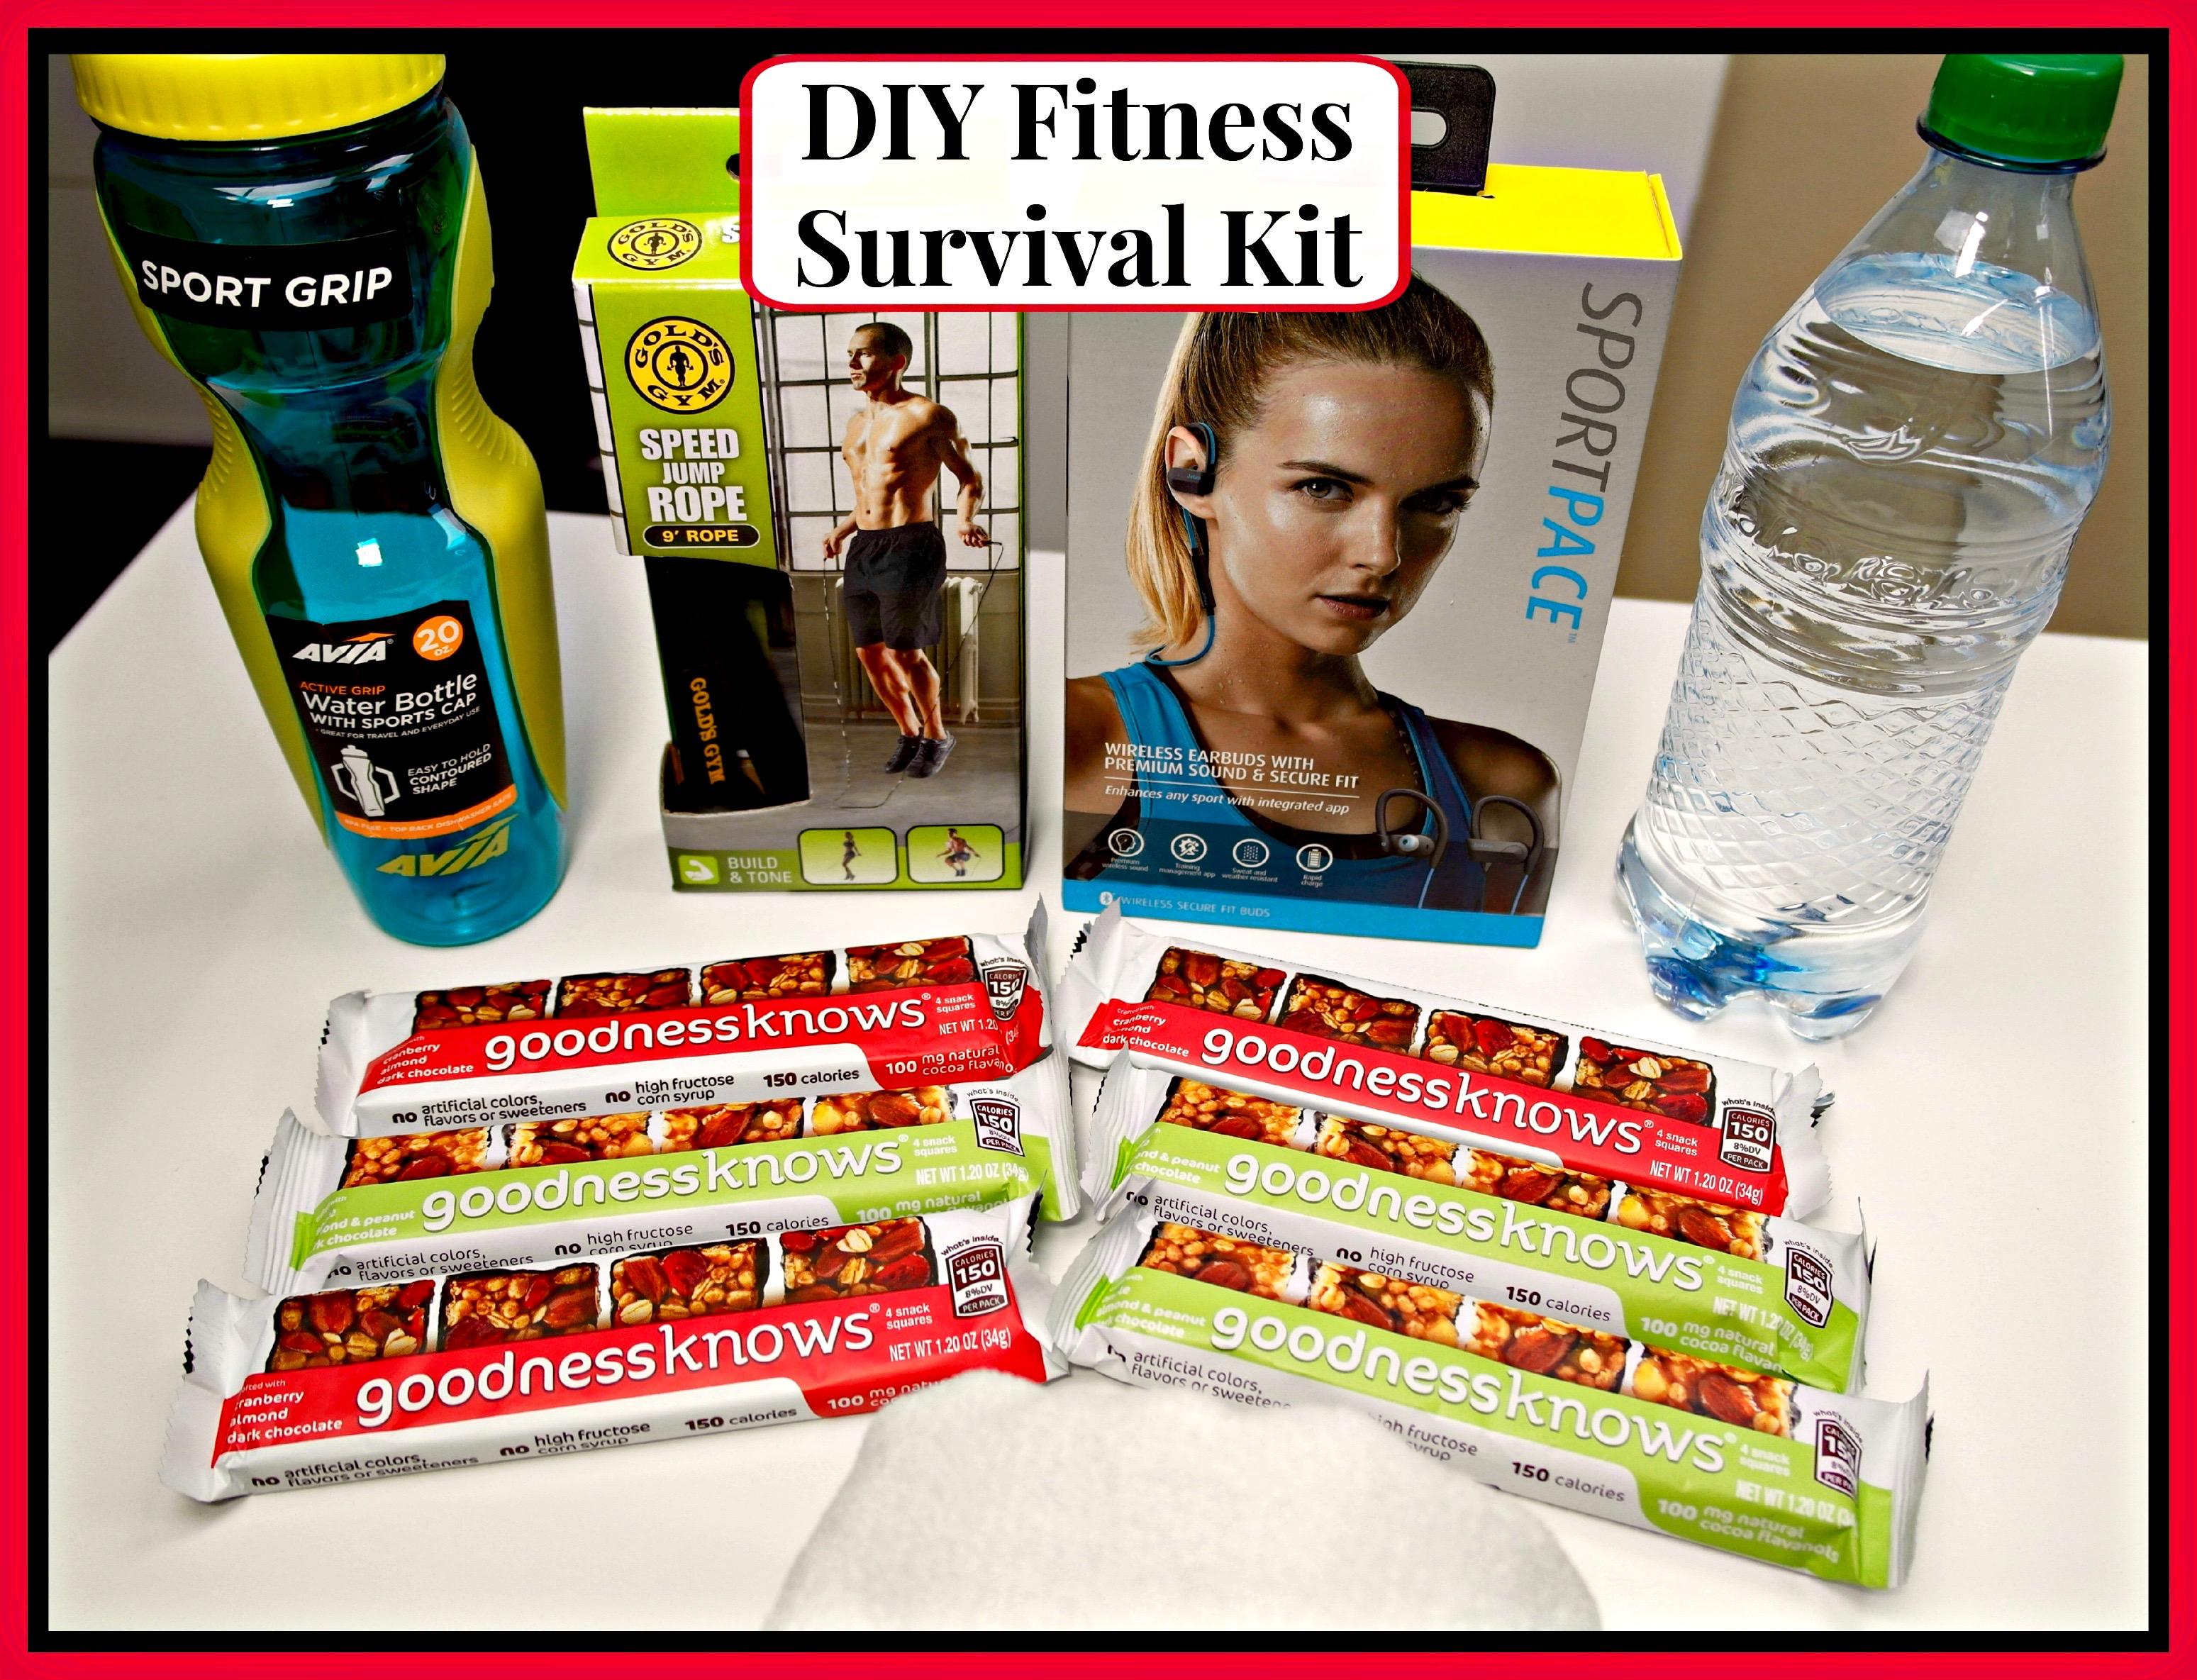 #TryALittleGoodness #Fitness #Health #DIY #ad